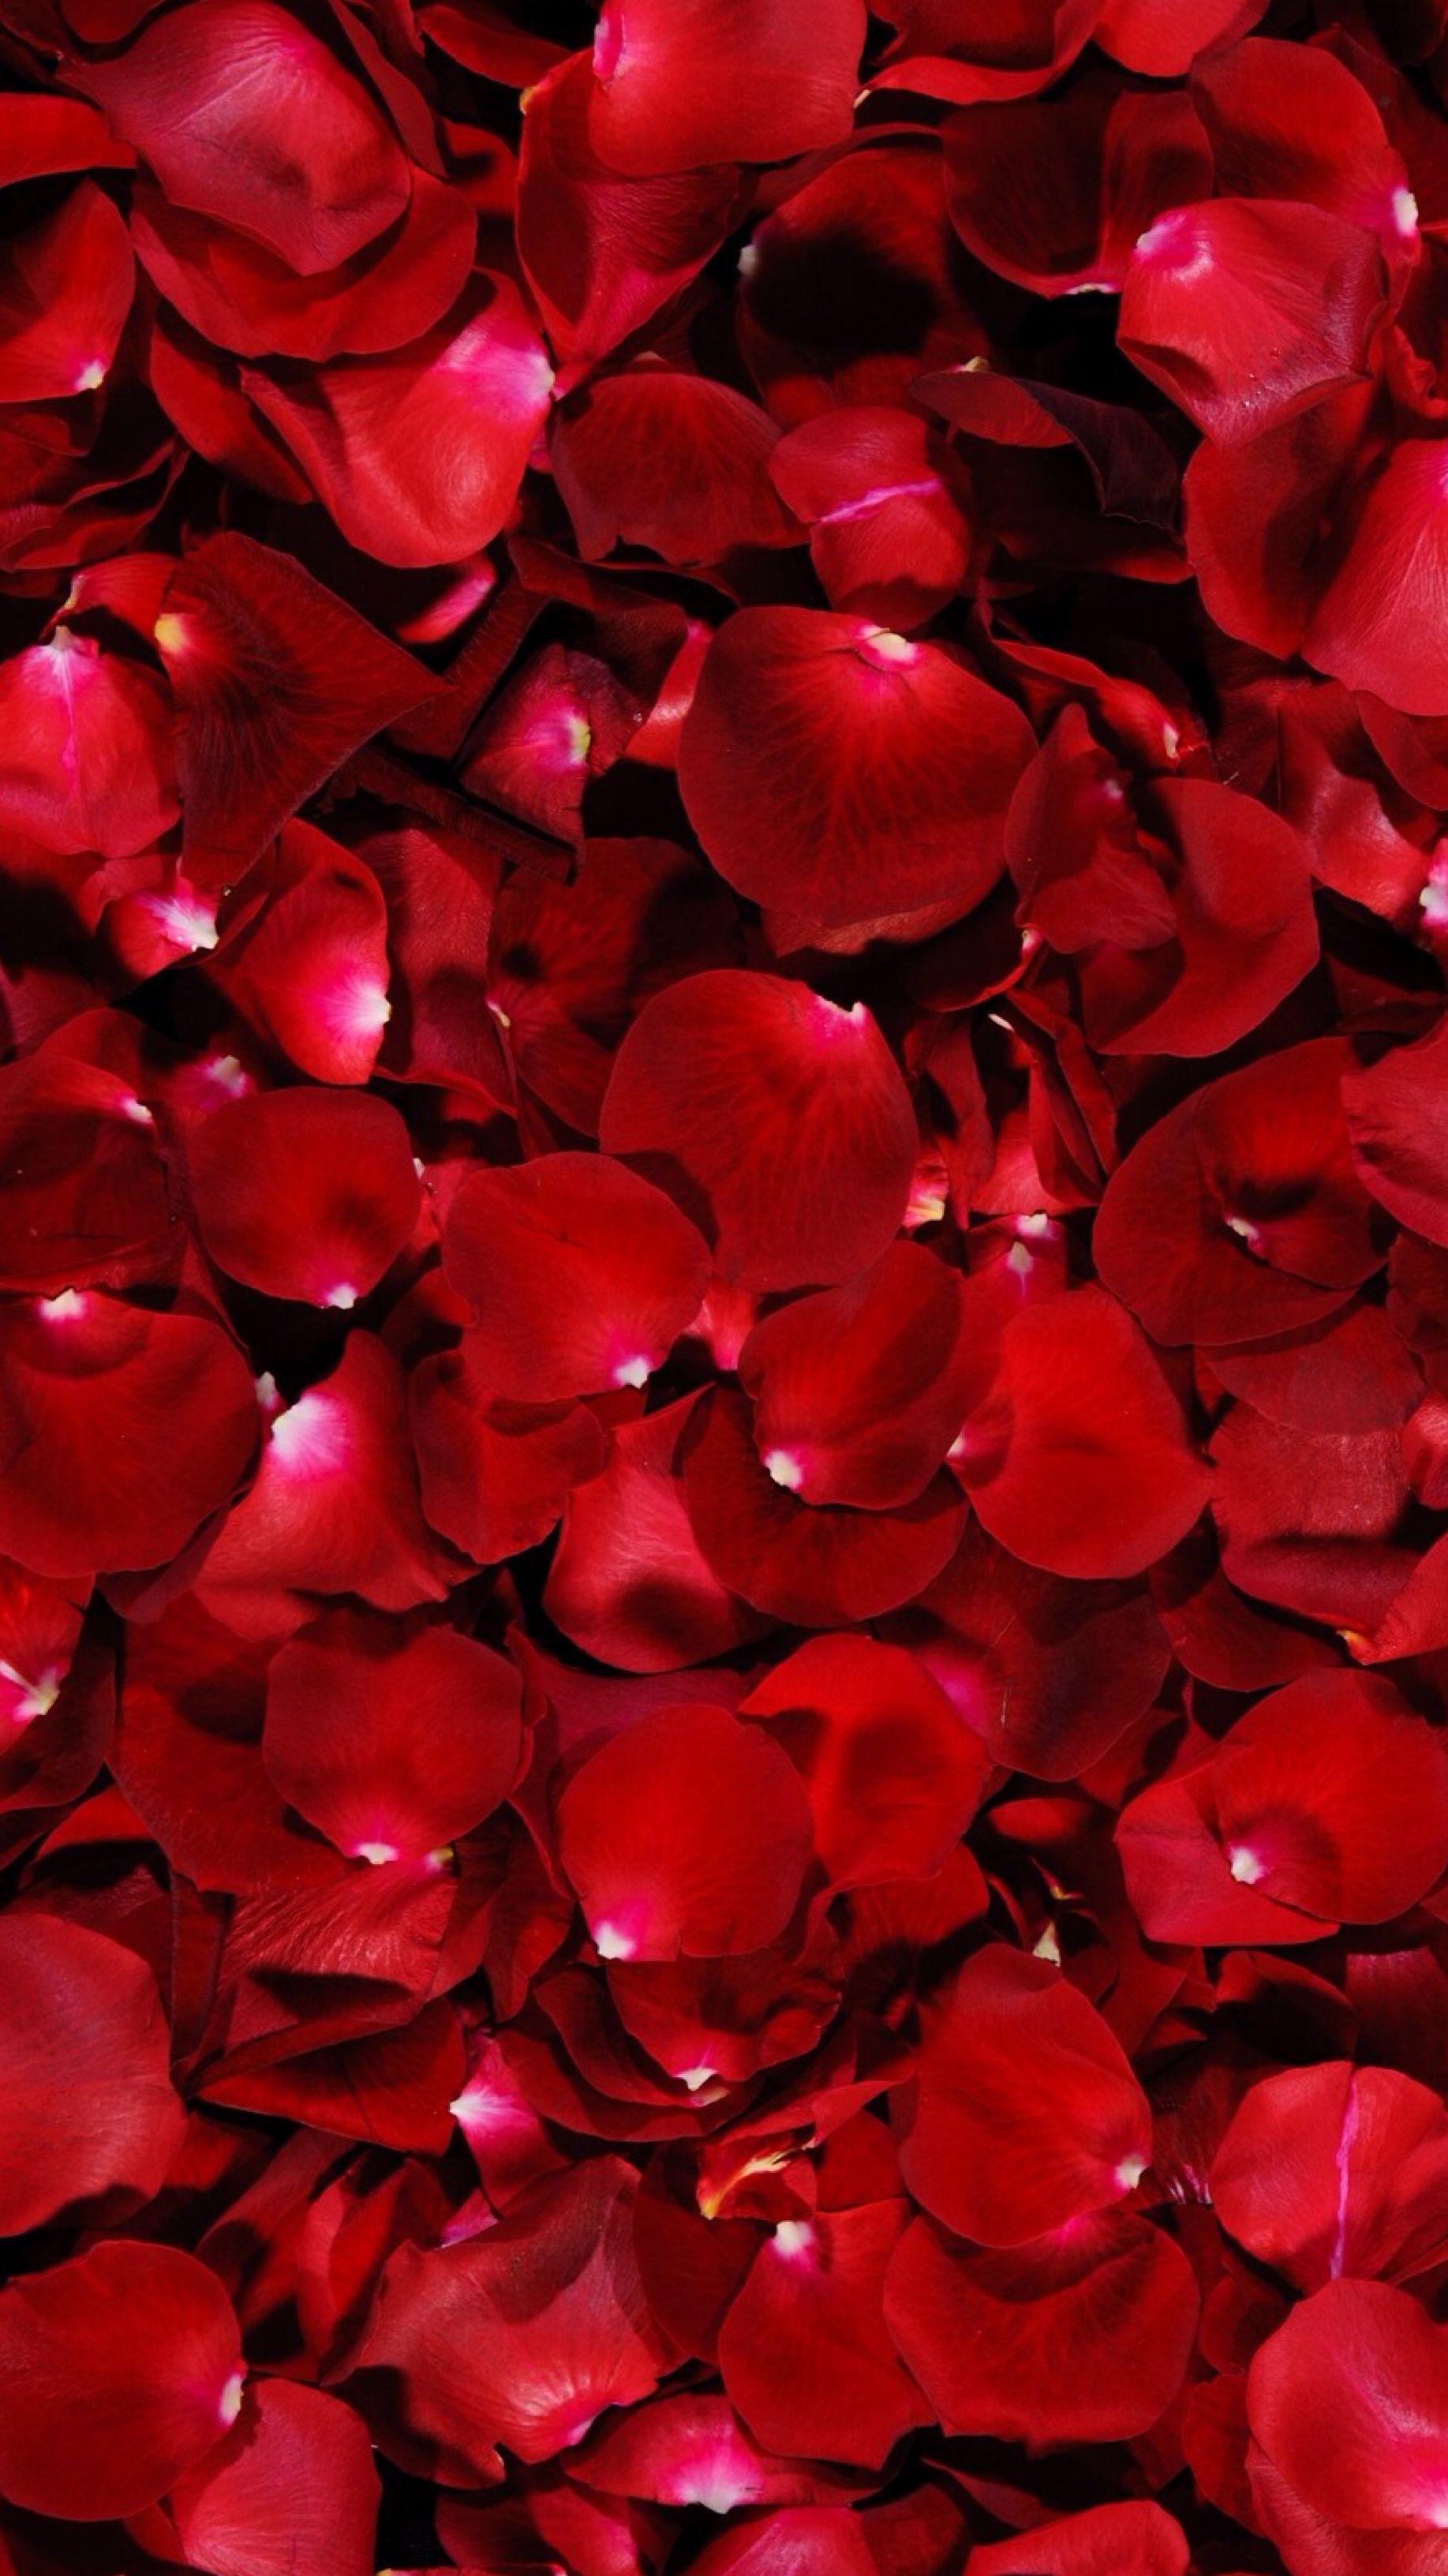 Red rose petals wallpaper wallpapers pinterest - Red rose petals wallpaper ...